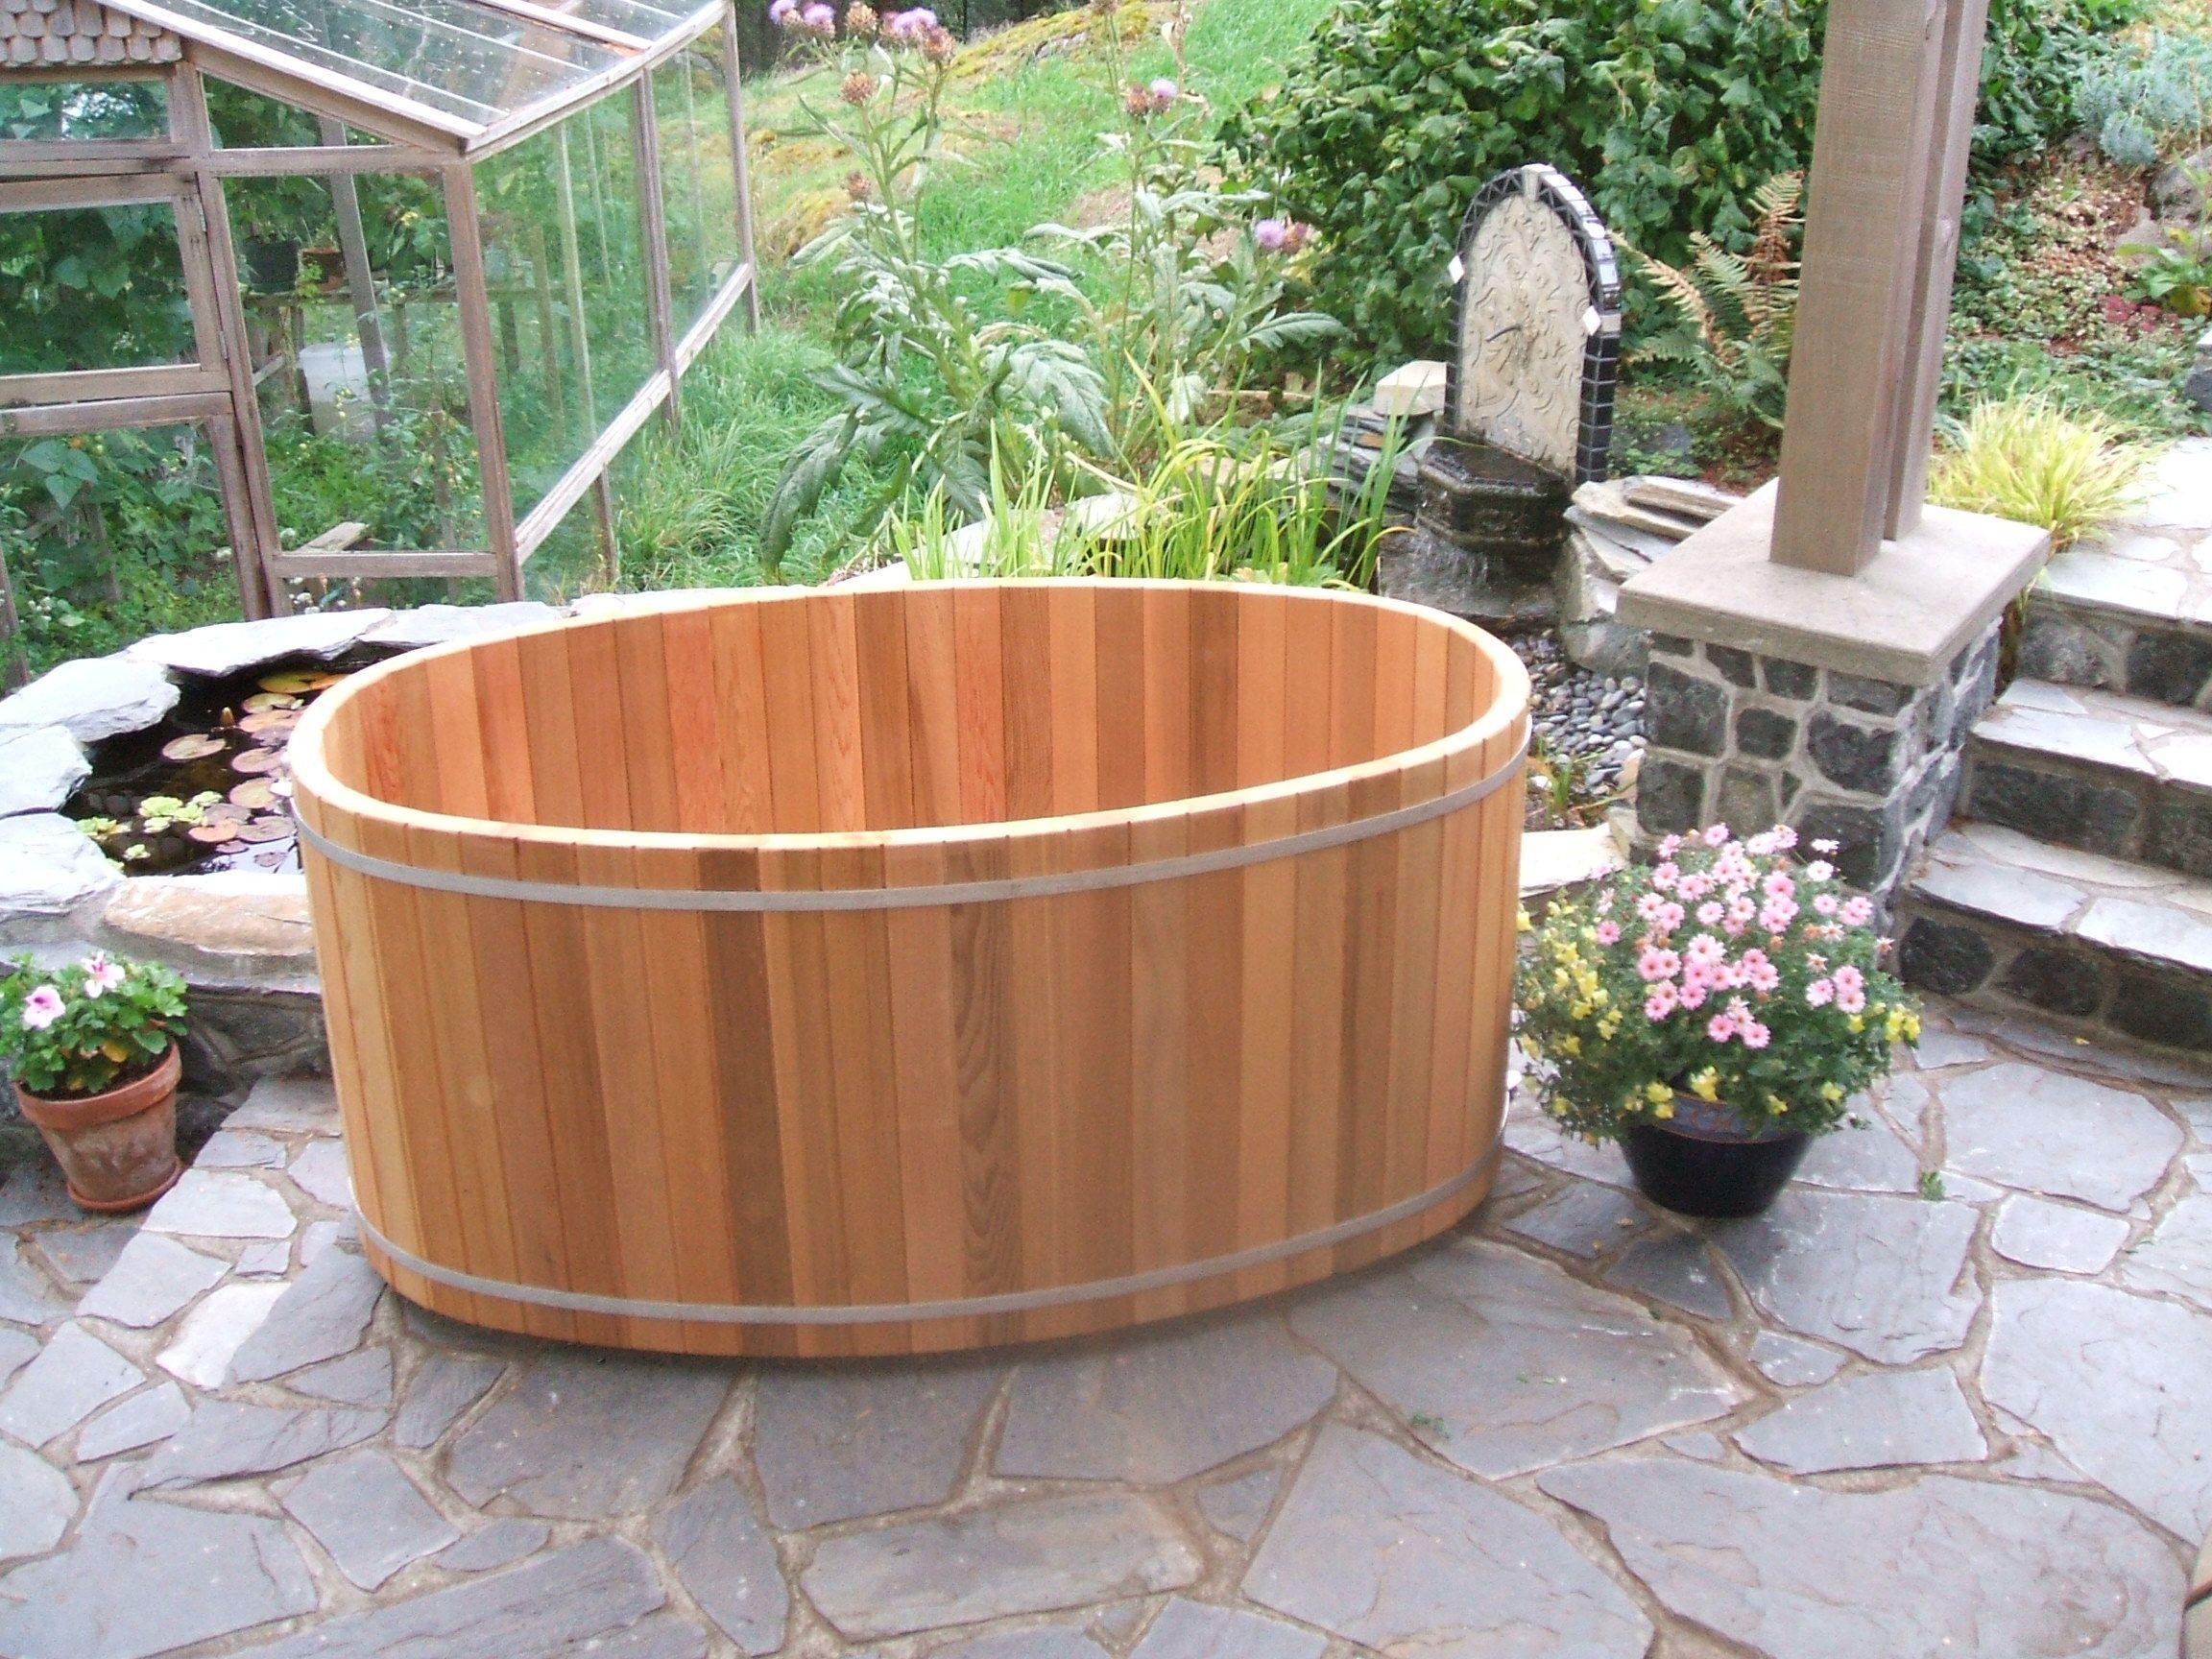 2 Person Oval Soaking Tub